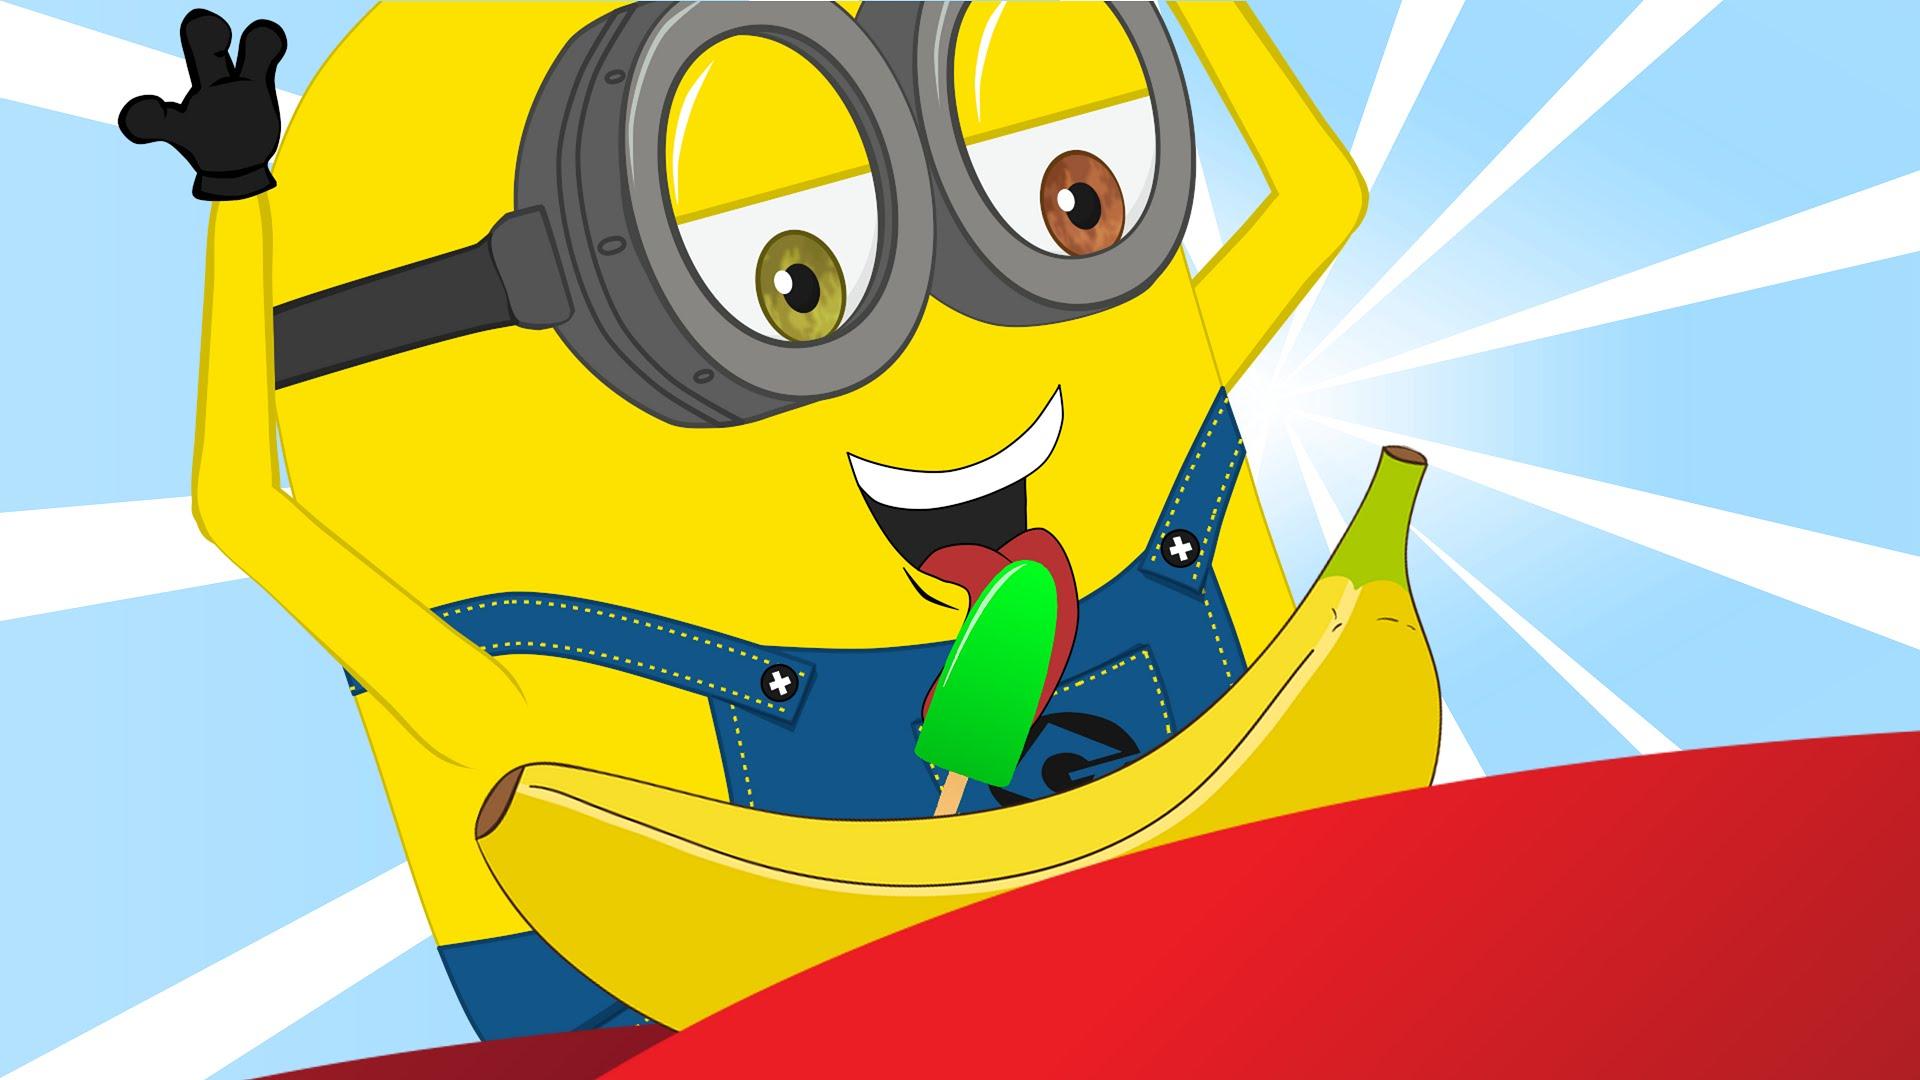 Banana clipart bus STATION Minions BUS #Minions Mini